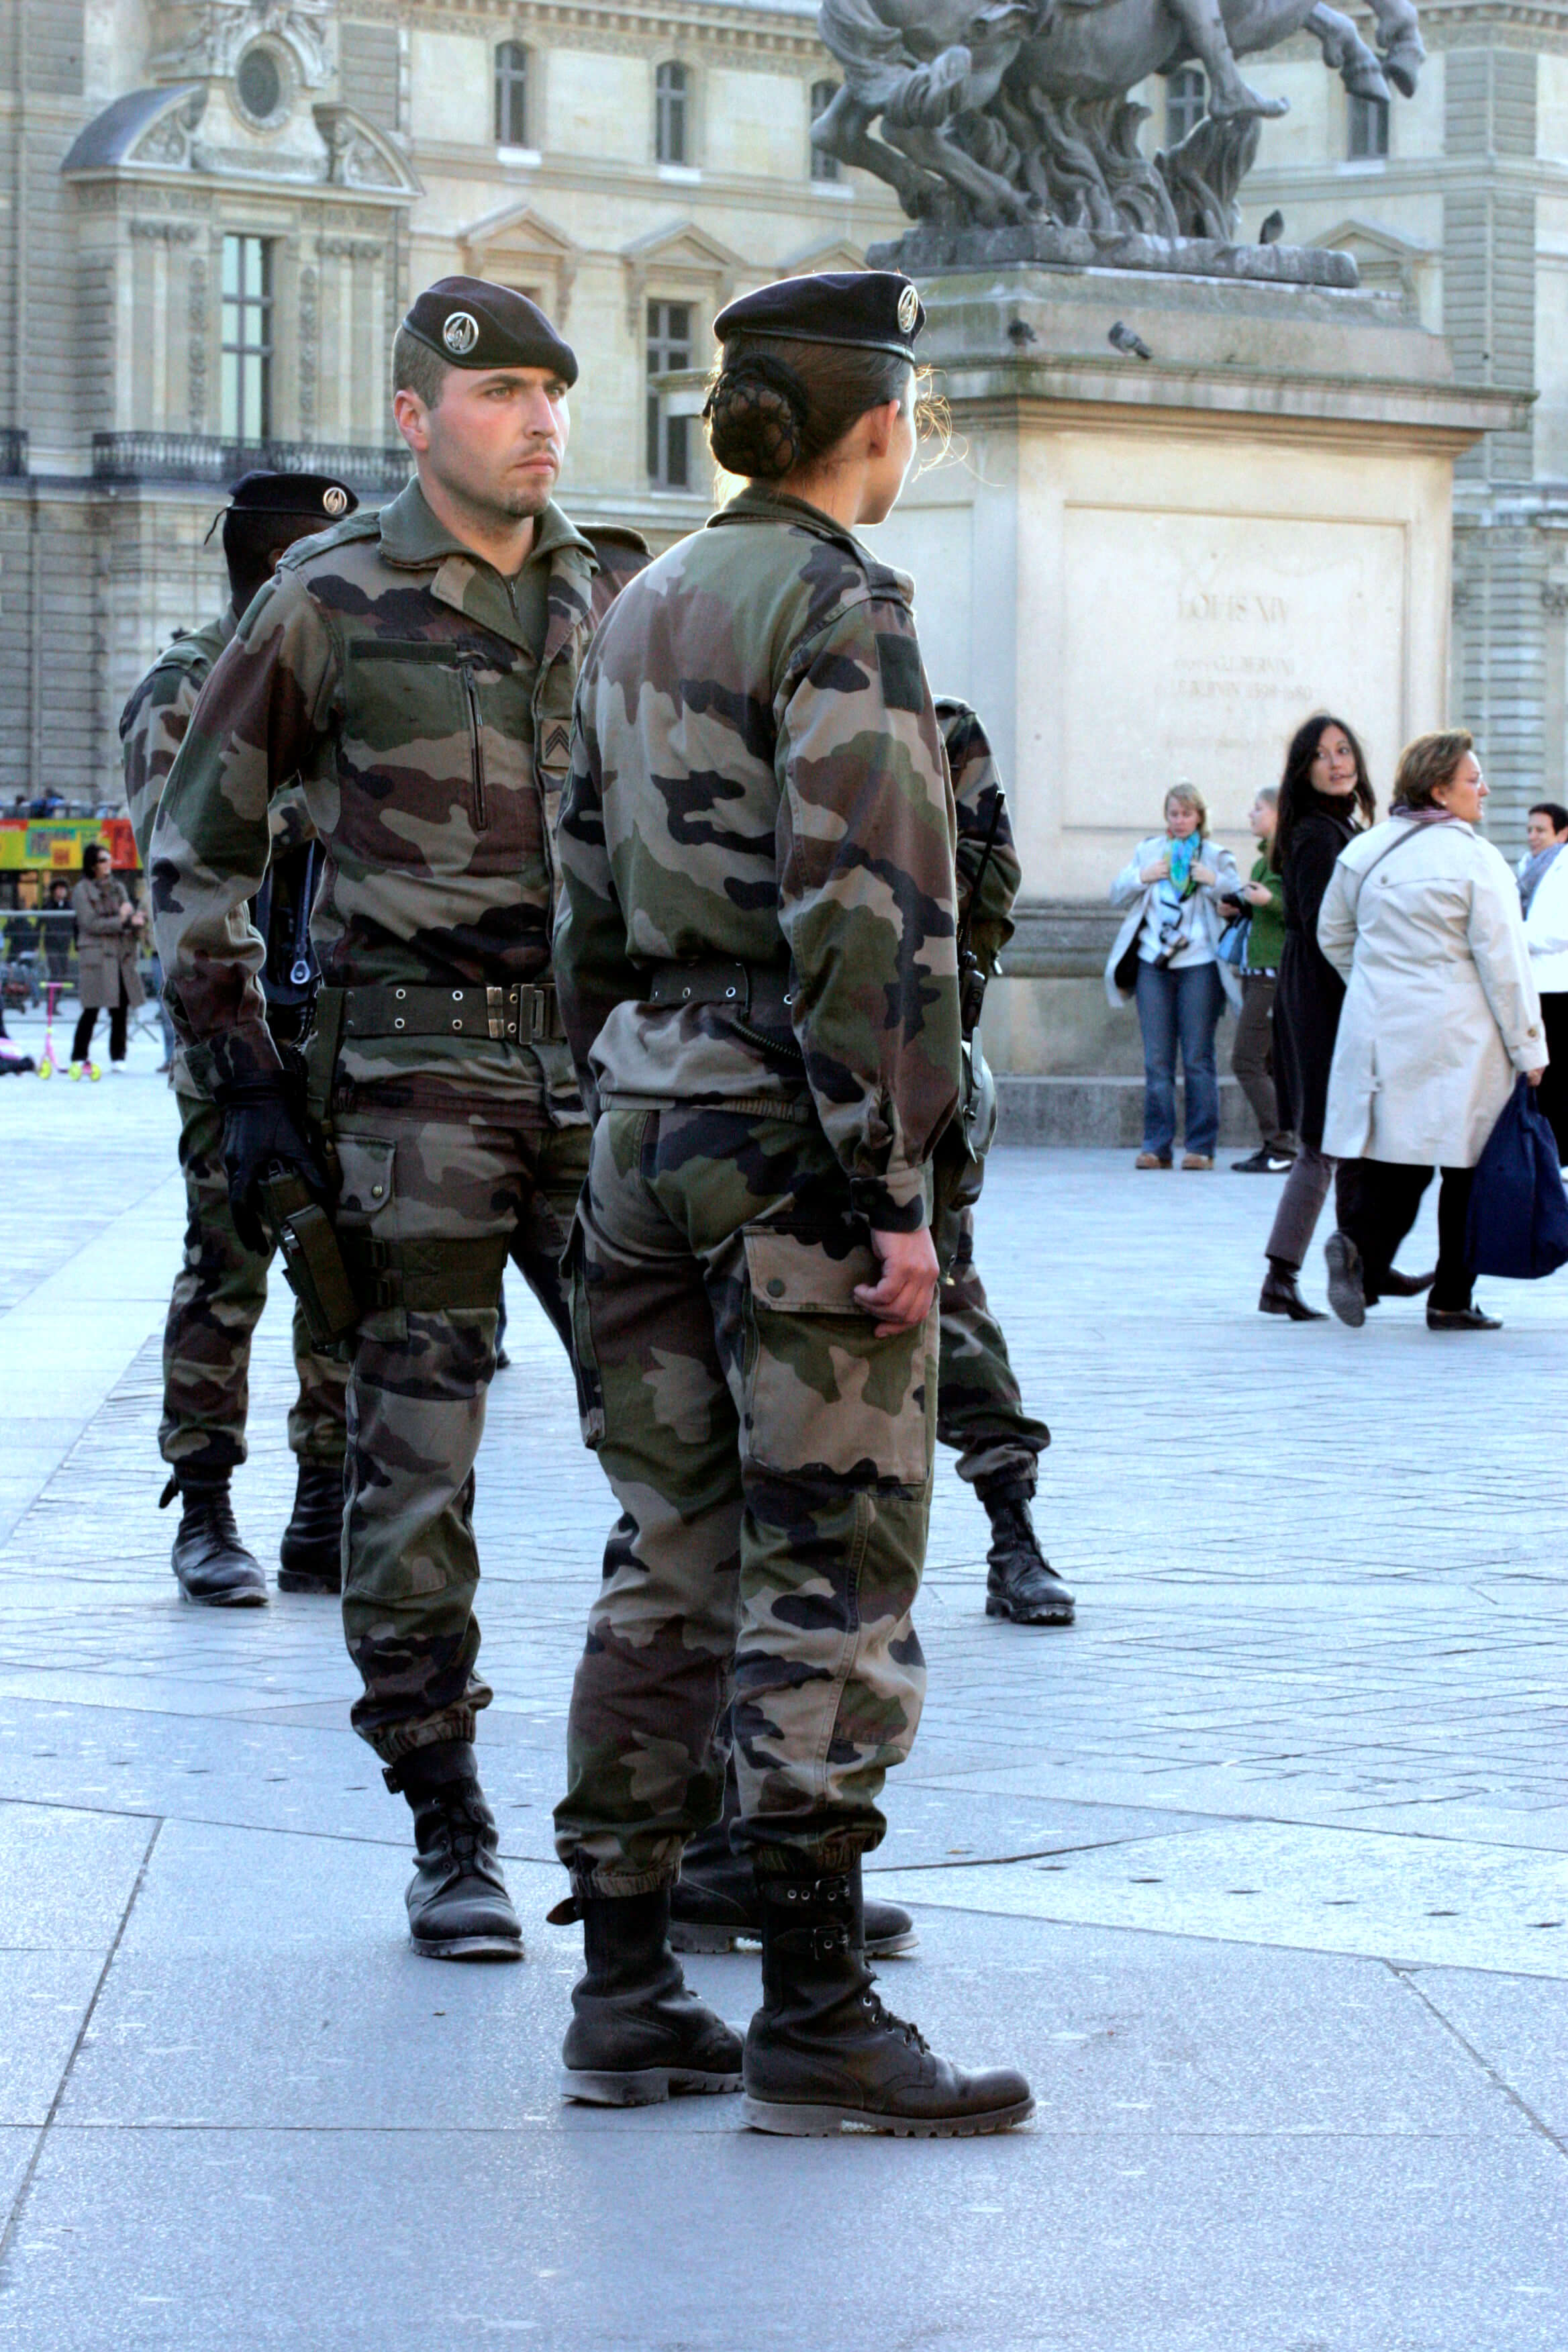 OxHRH Webinar-Counter-Terrorism and Security in Europe after the Paris Attacks-Prof Fiona de Londras (Birmingham)